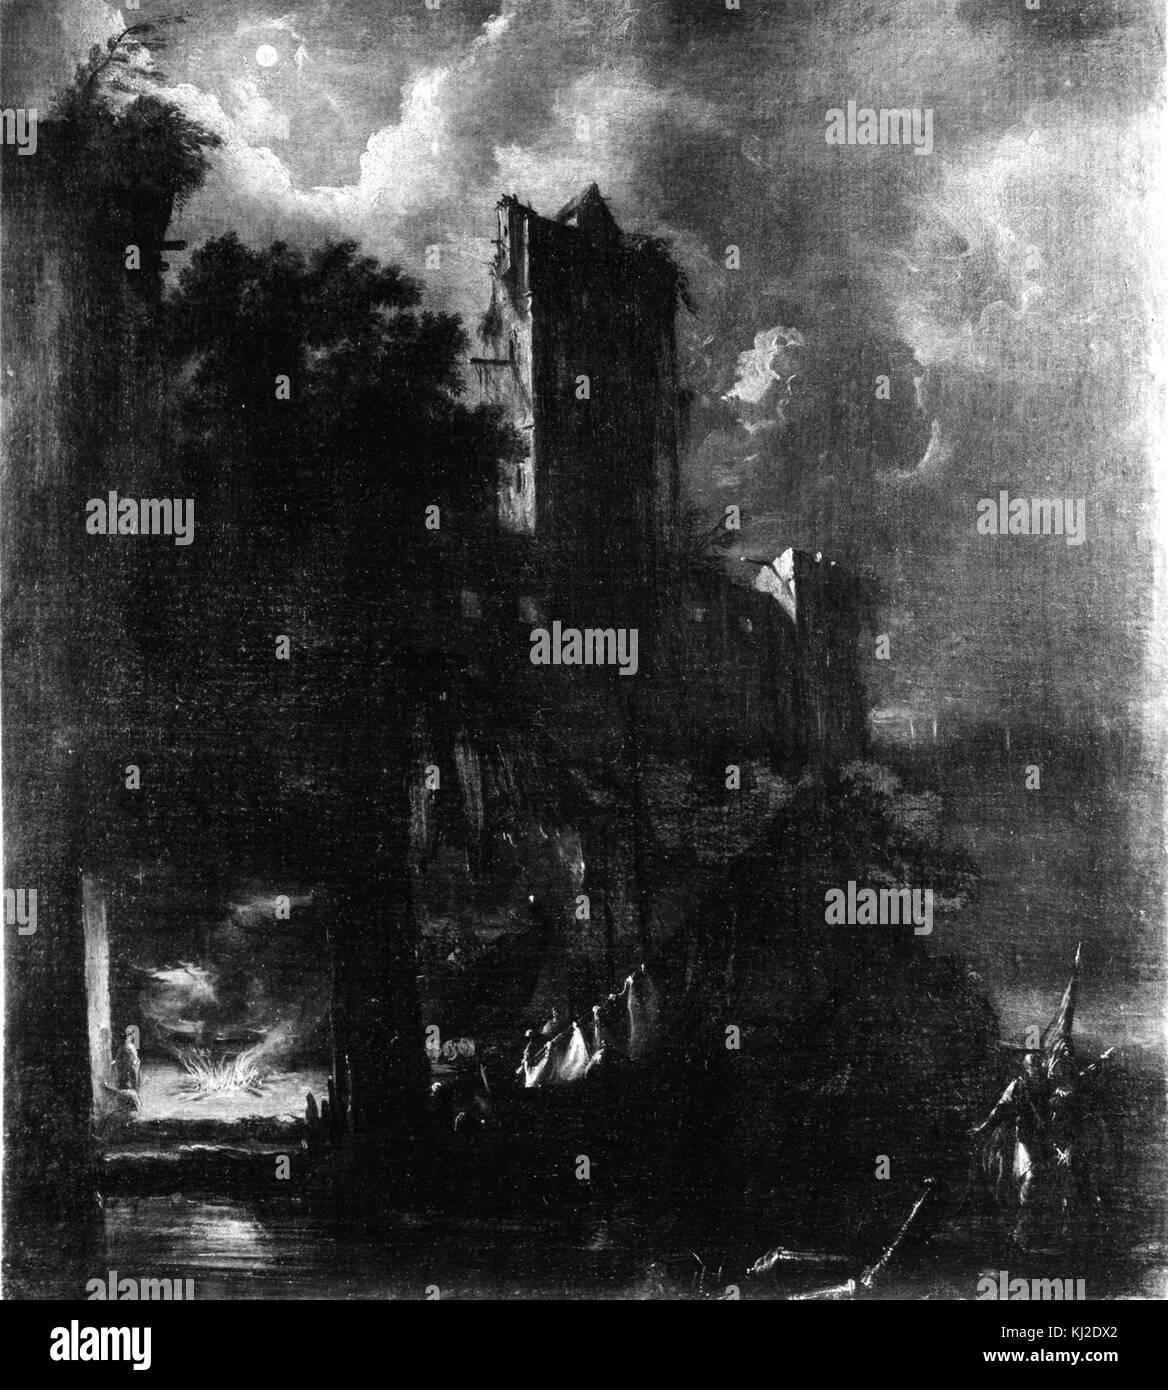 Bartolomeo Pedon - Moonlit Landscape with Ruined Castle - Walters 37348 - Stock Image